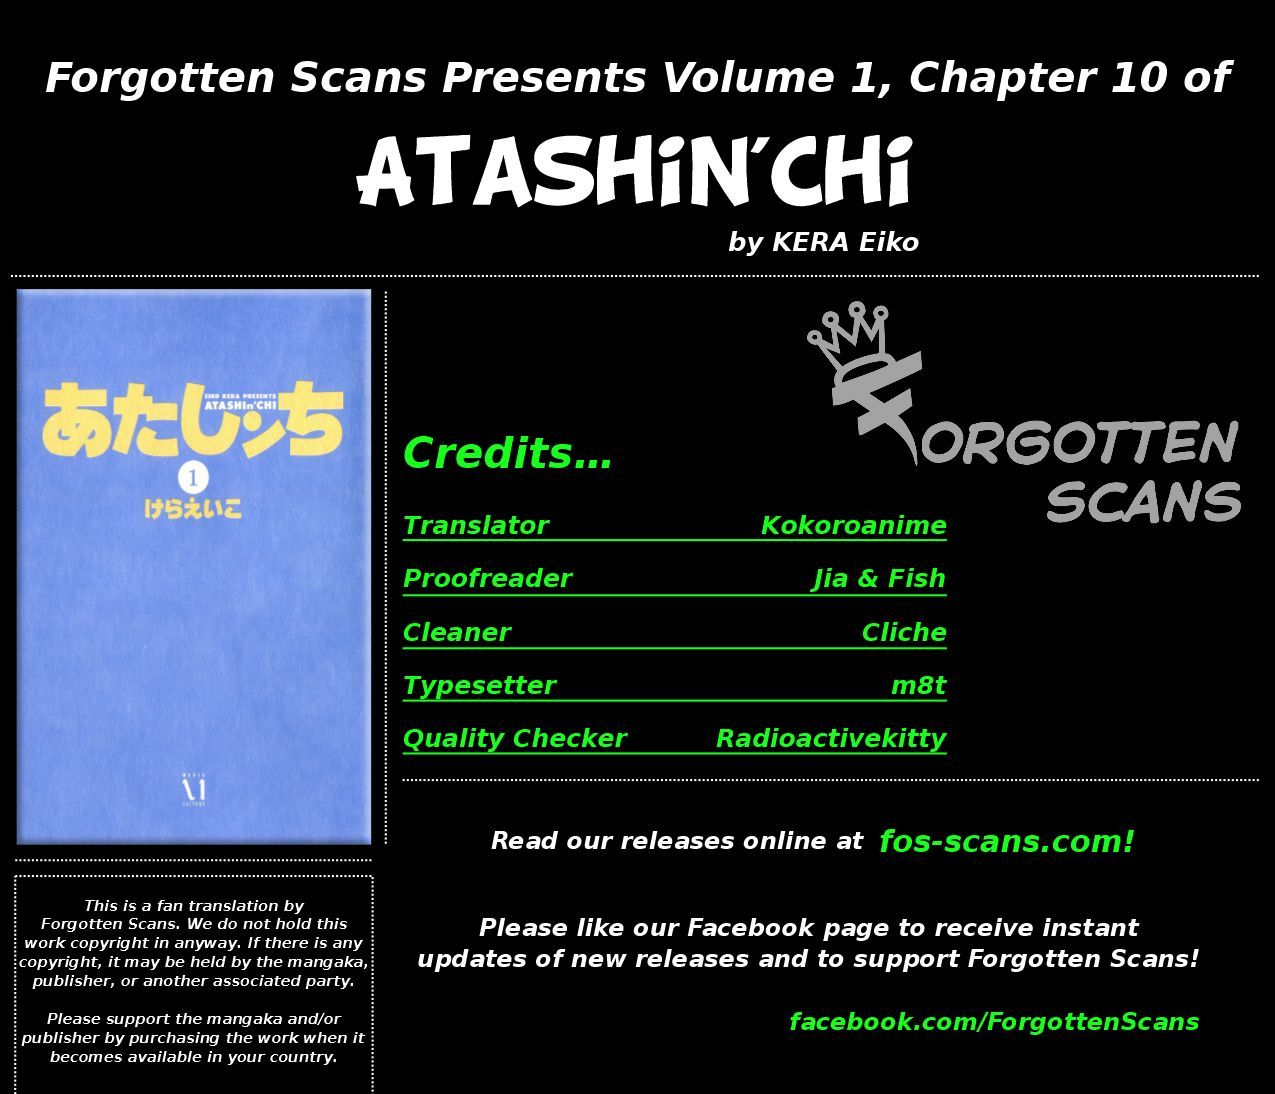 https://im.nineanime.com/comics/pic9/50/1650/50331/Atashinchi100585.jpg Page 1